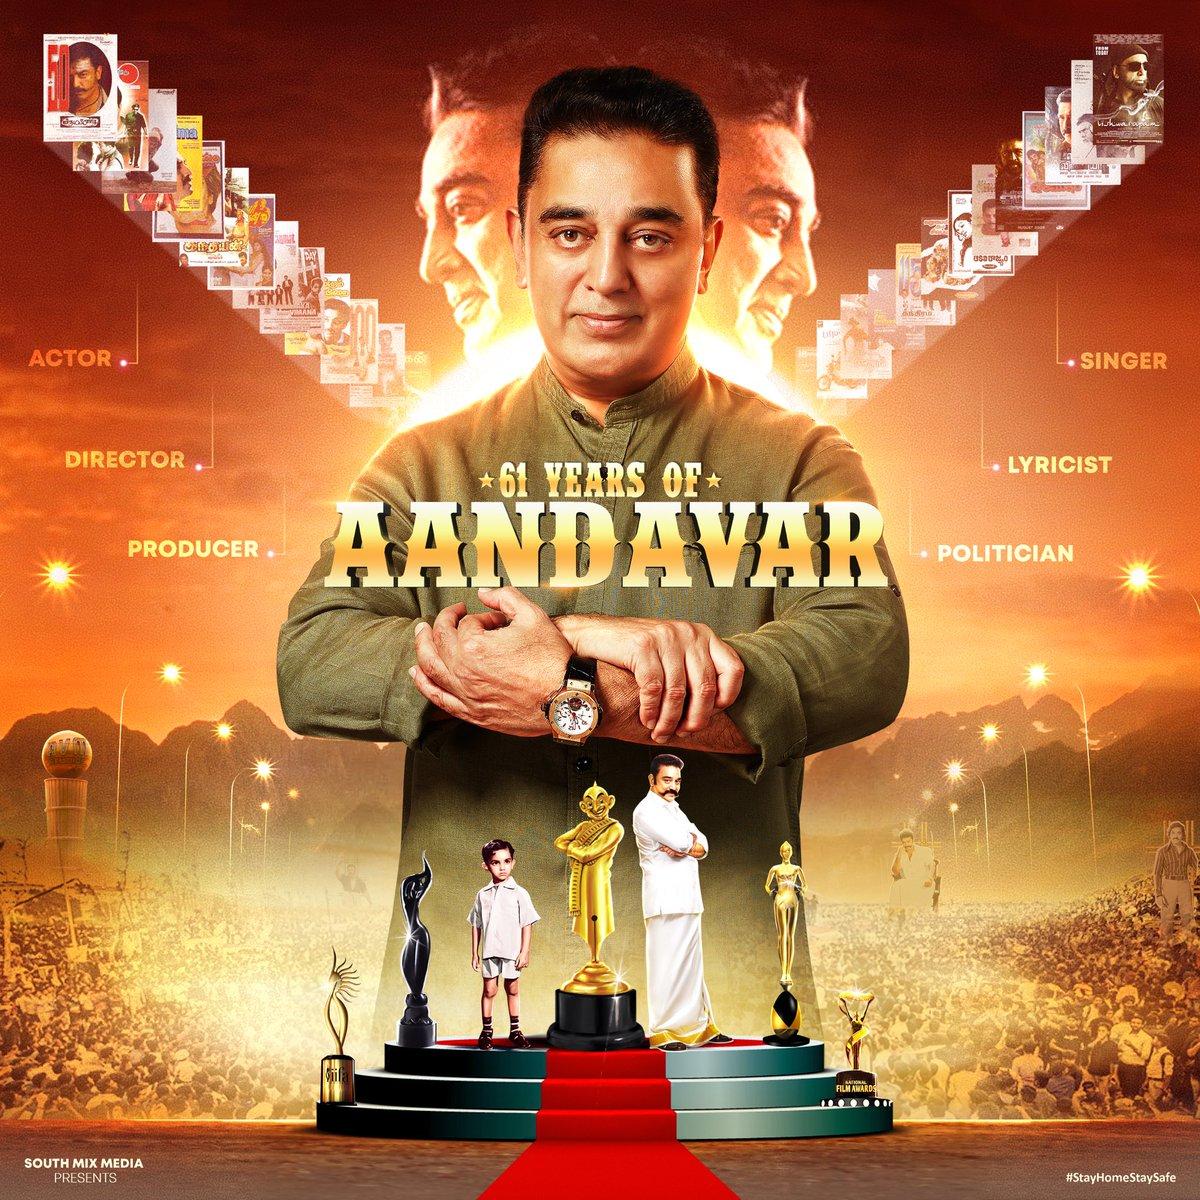 Here is the CDP of @ikamalhaasan  sir 61years in film industry  #61YearsOfKamalismCdp #SouthMixMedia @ikamalhaasan @SouthMixMedia